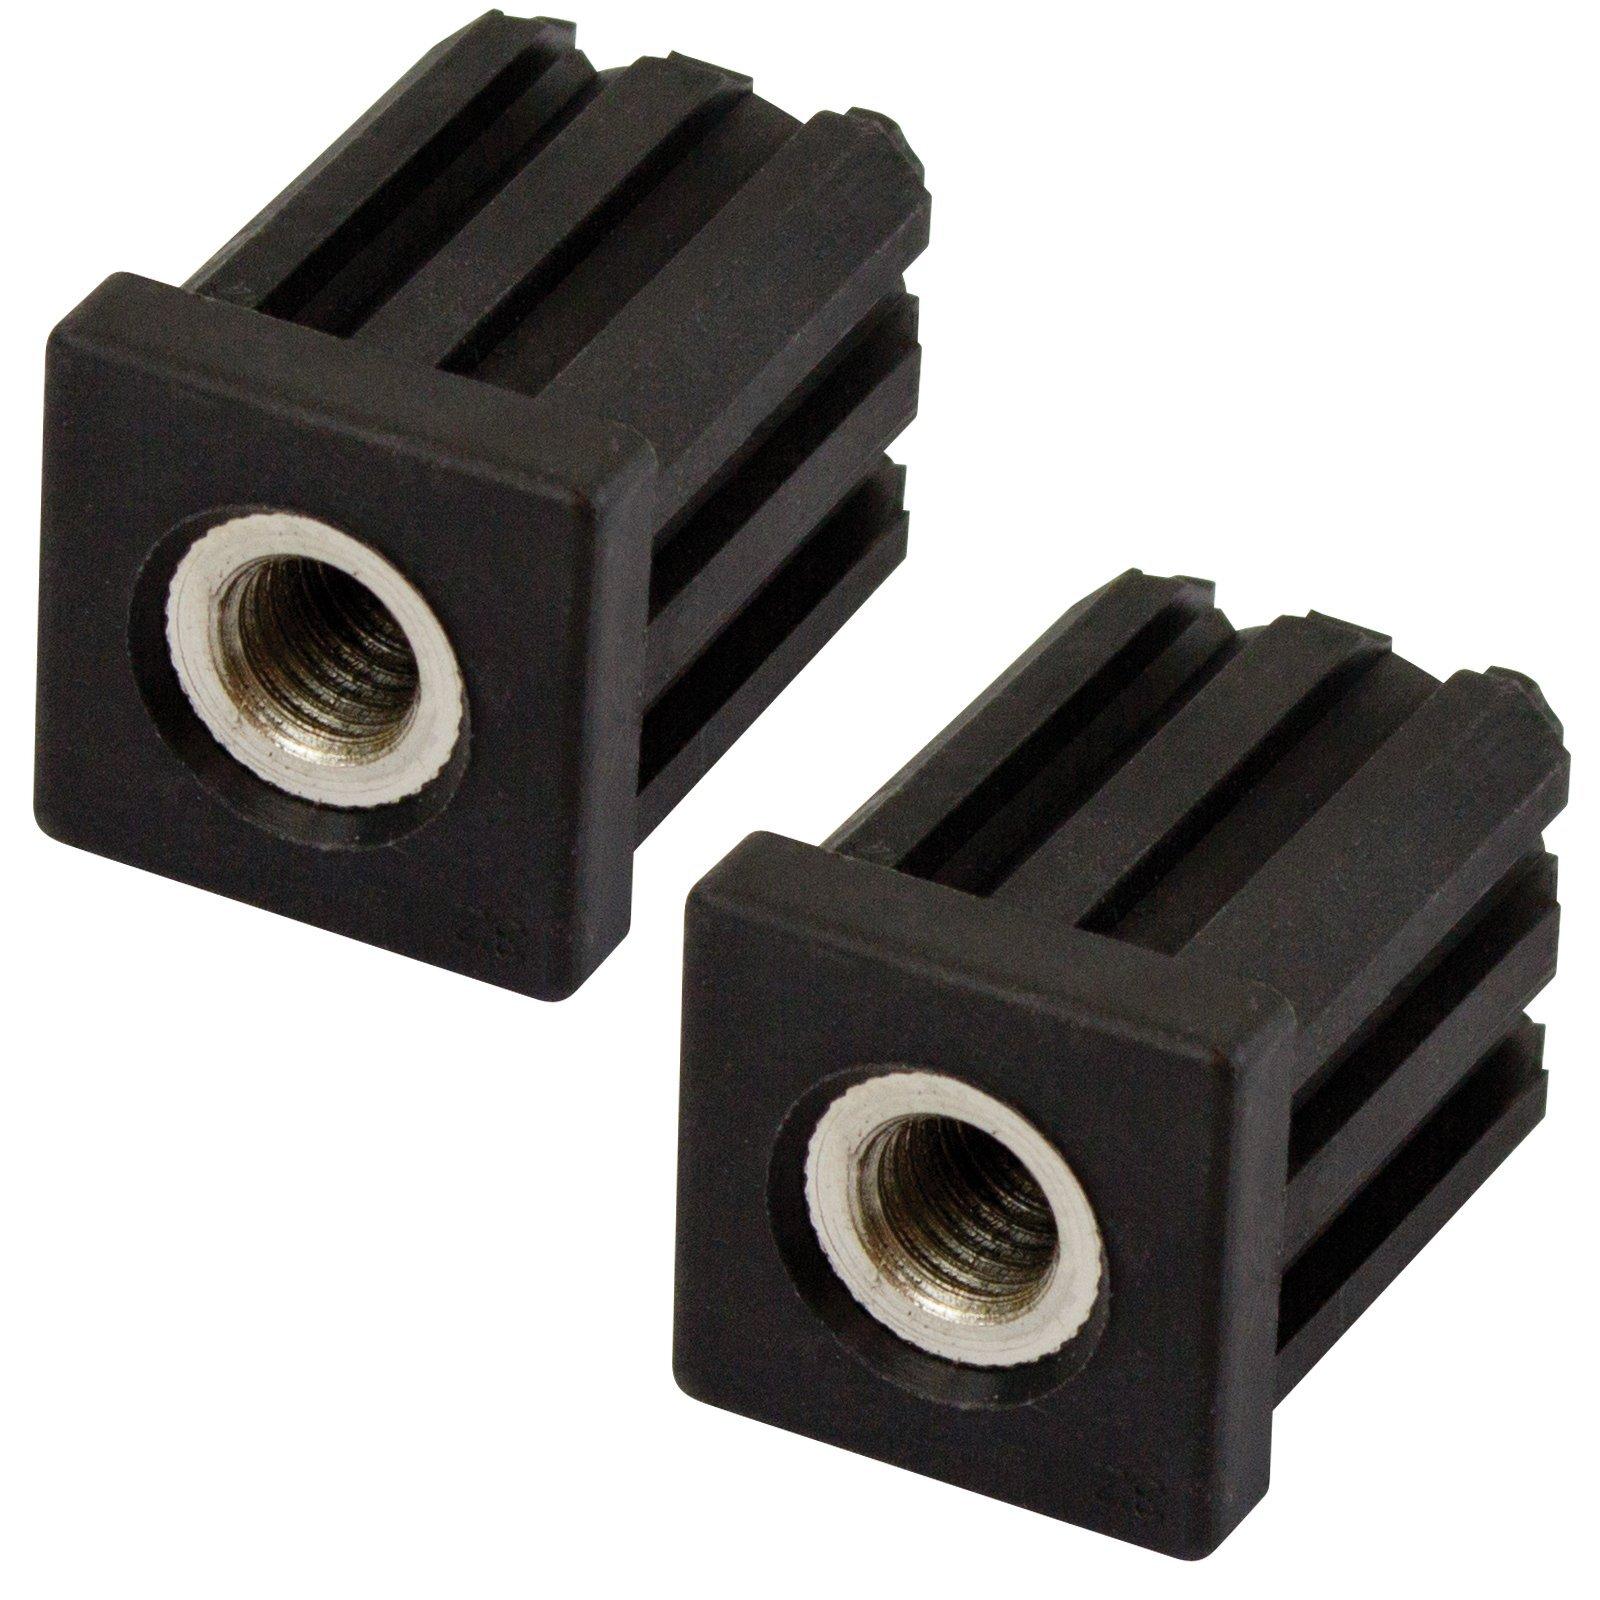 Richmond 32mm x M12 Square Threaded Tube Insert - 2 Pack